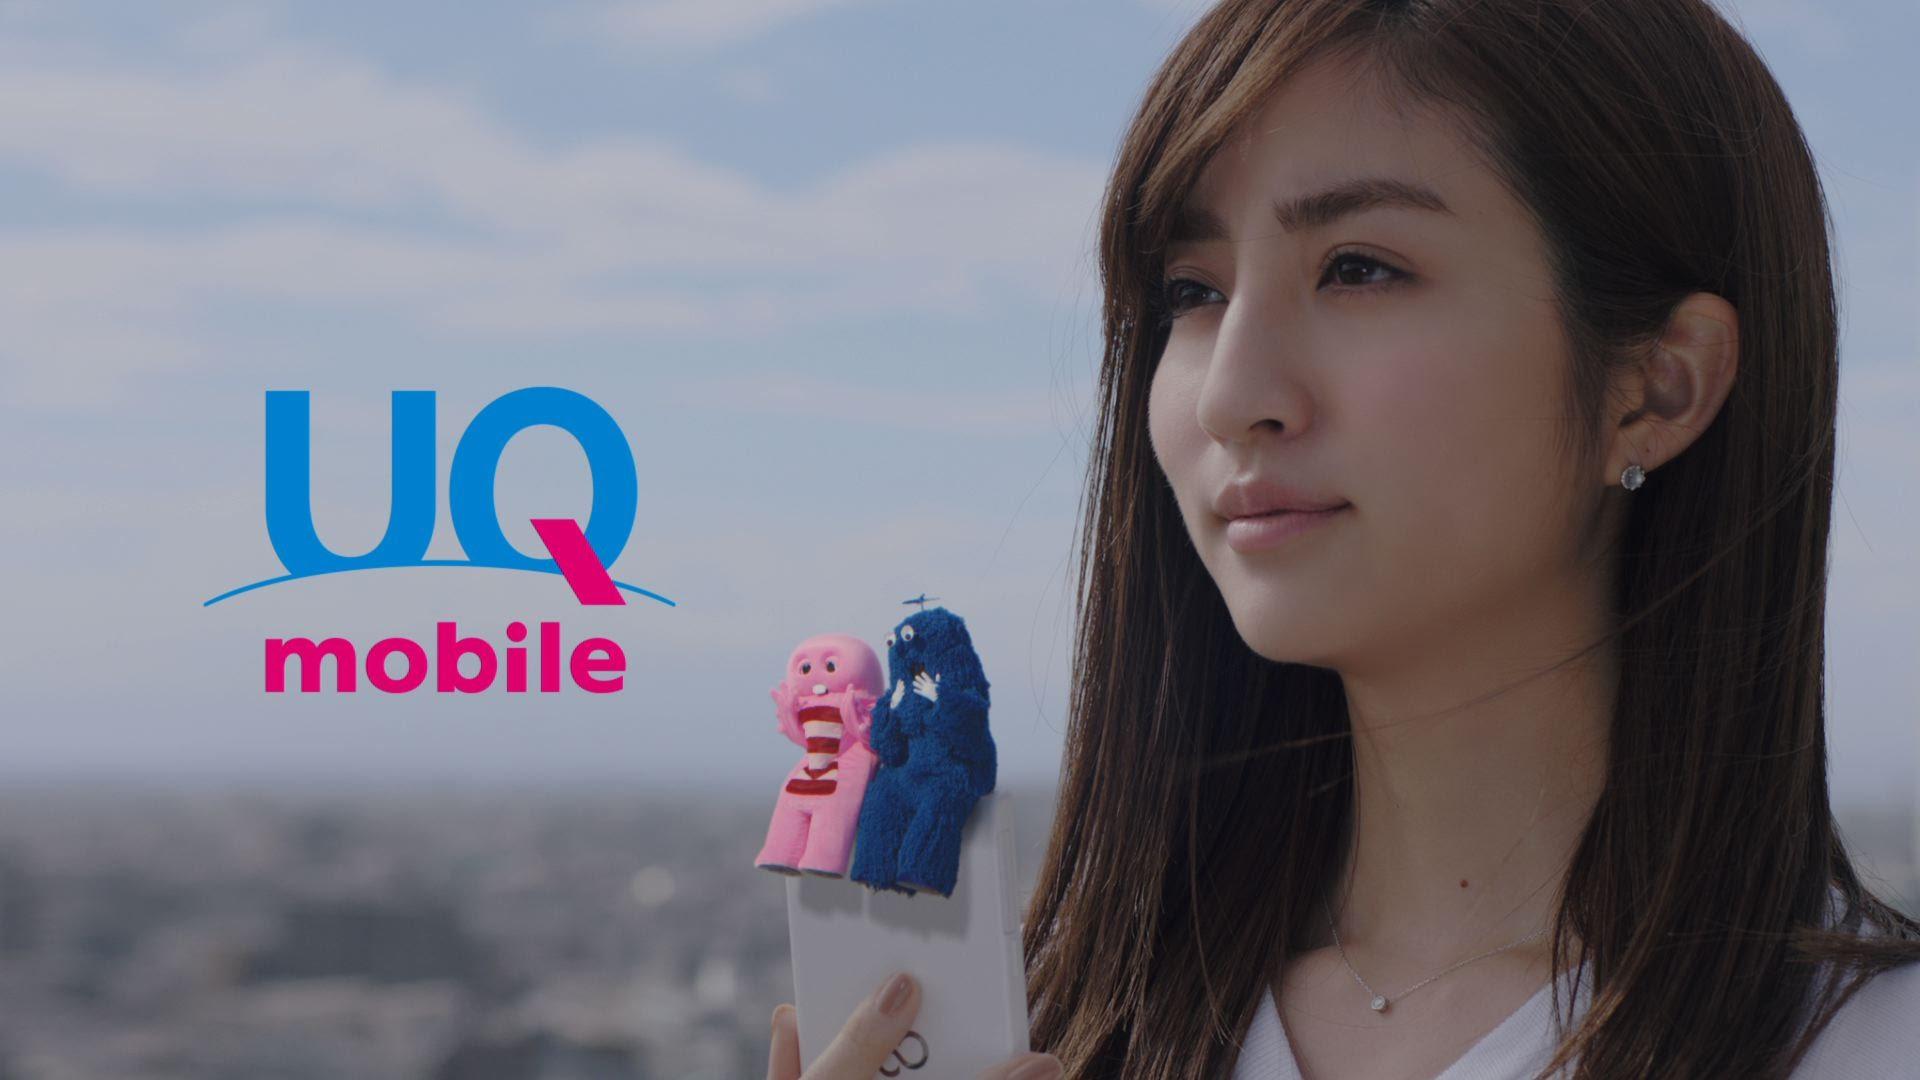 Uq Mobile 思いっきり叫ぶ 篇 堀田茜 Tvcm Cmソング Max